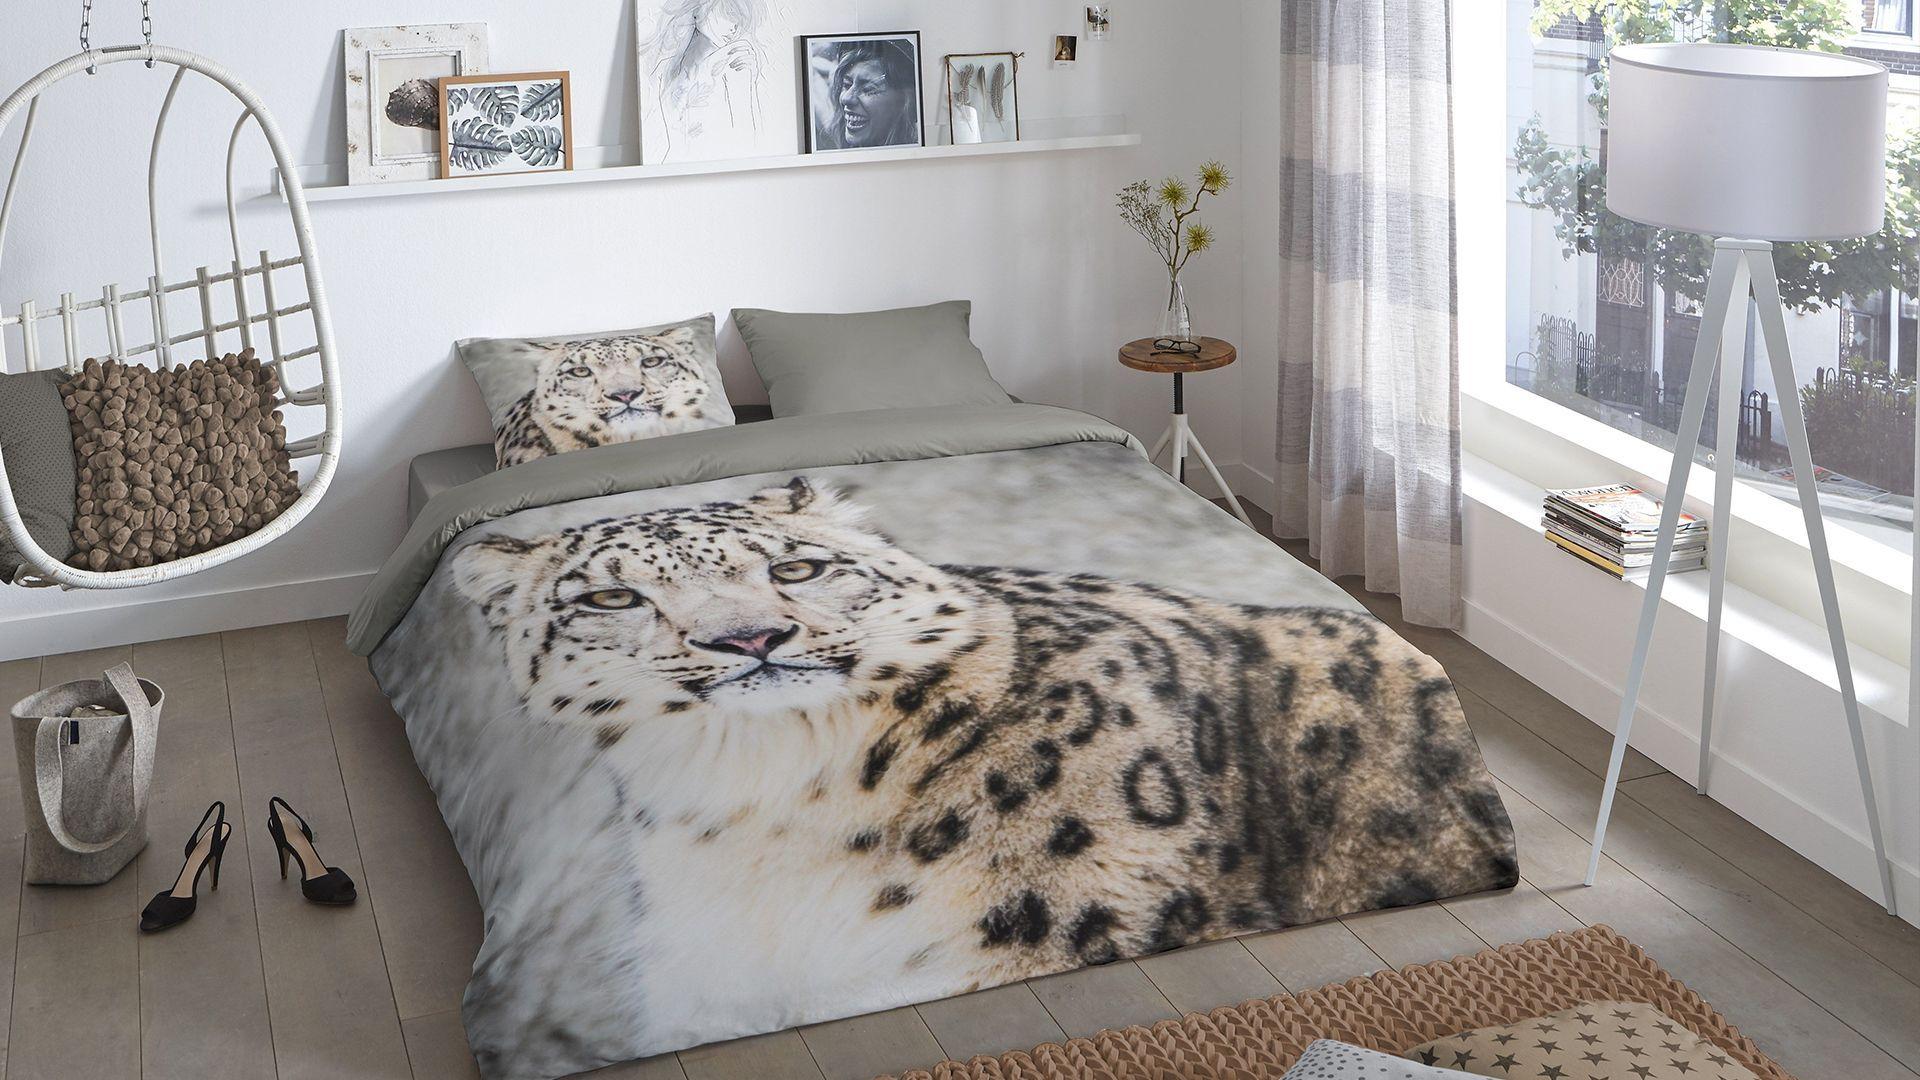 Good Morning Snow Leopard dekbedovertrek